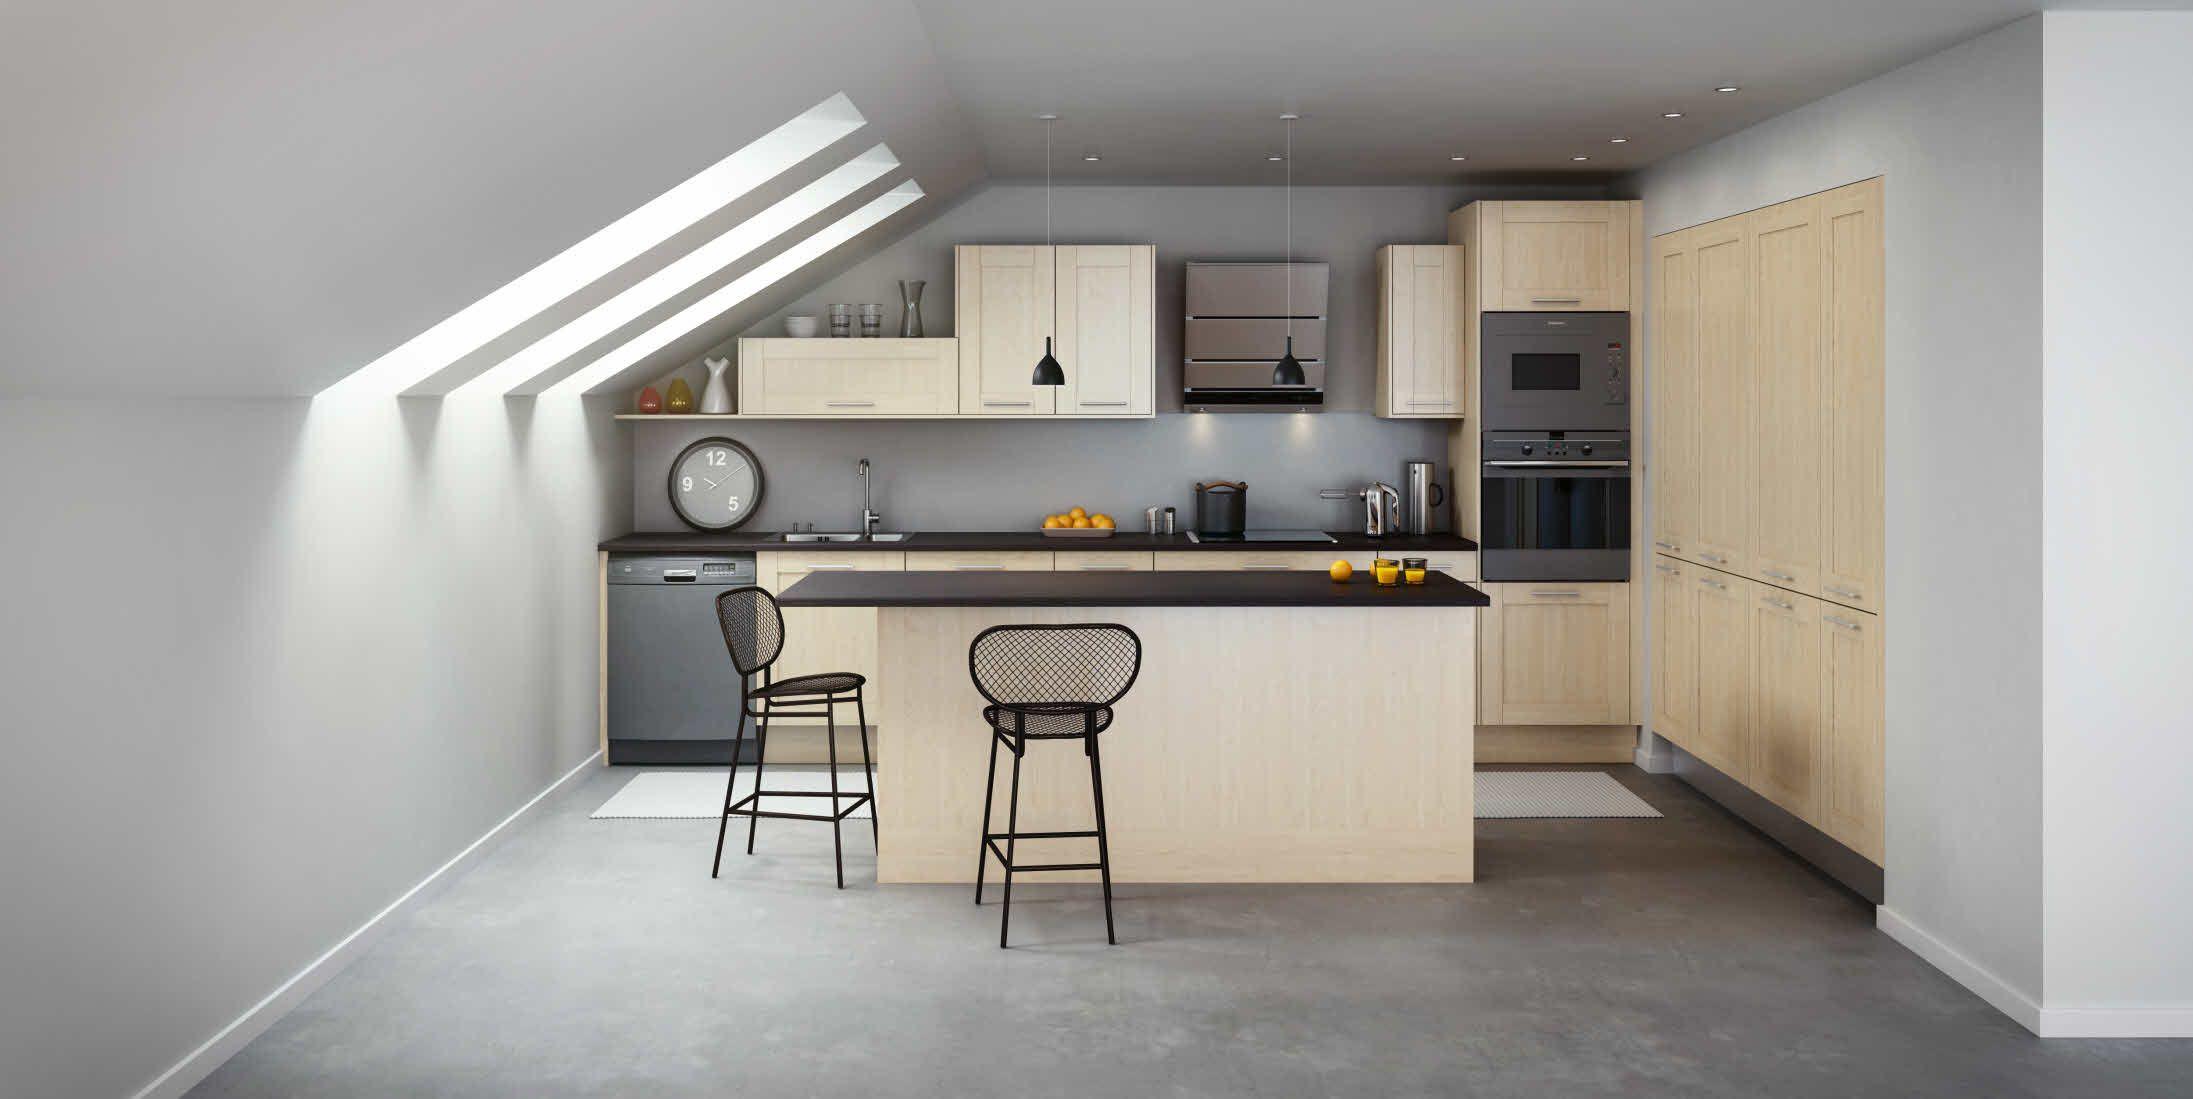 cuisine hygena mod le strandra bouleau des cuisines au naturel pinterest. Black Bedroom Furniture Sets. Home Design Ideas